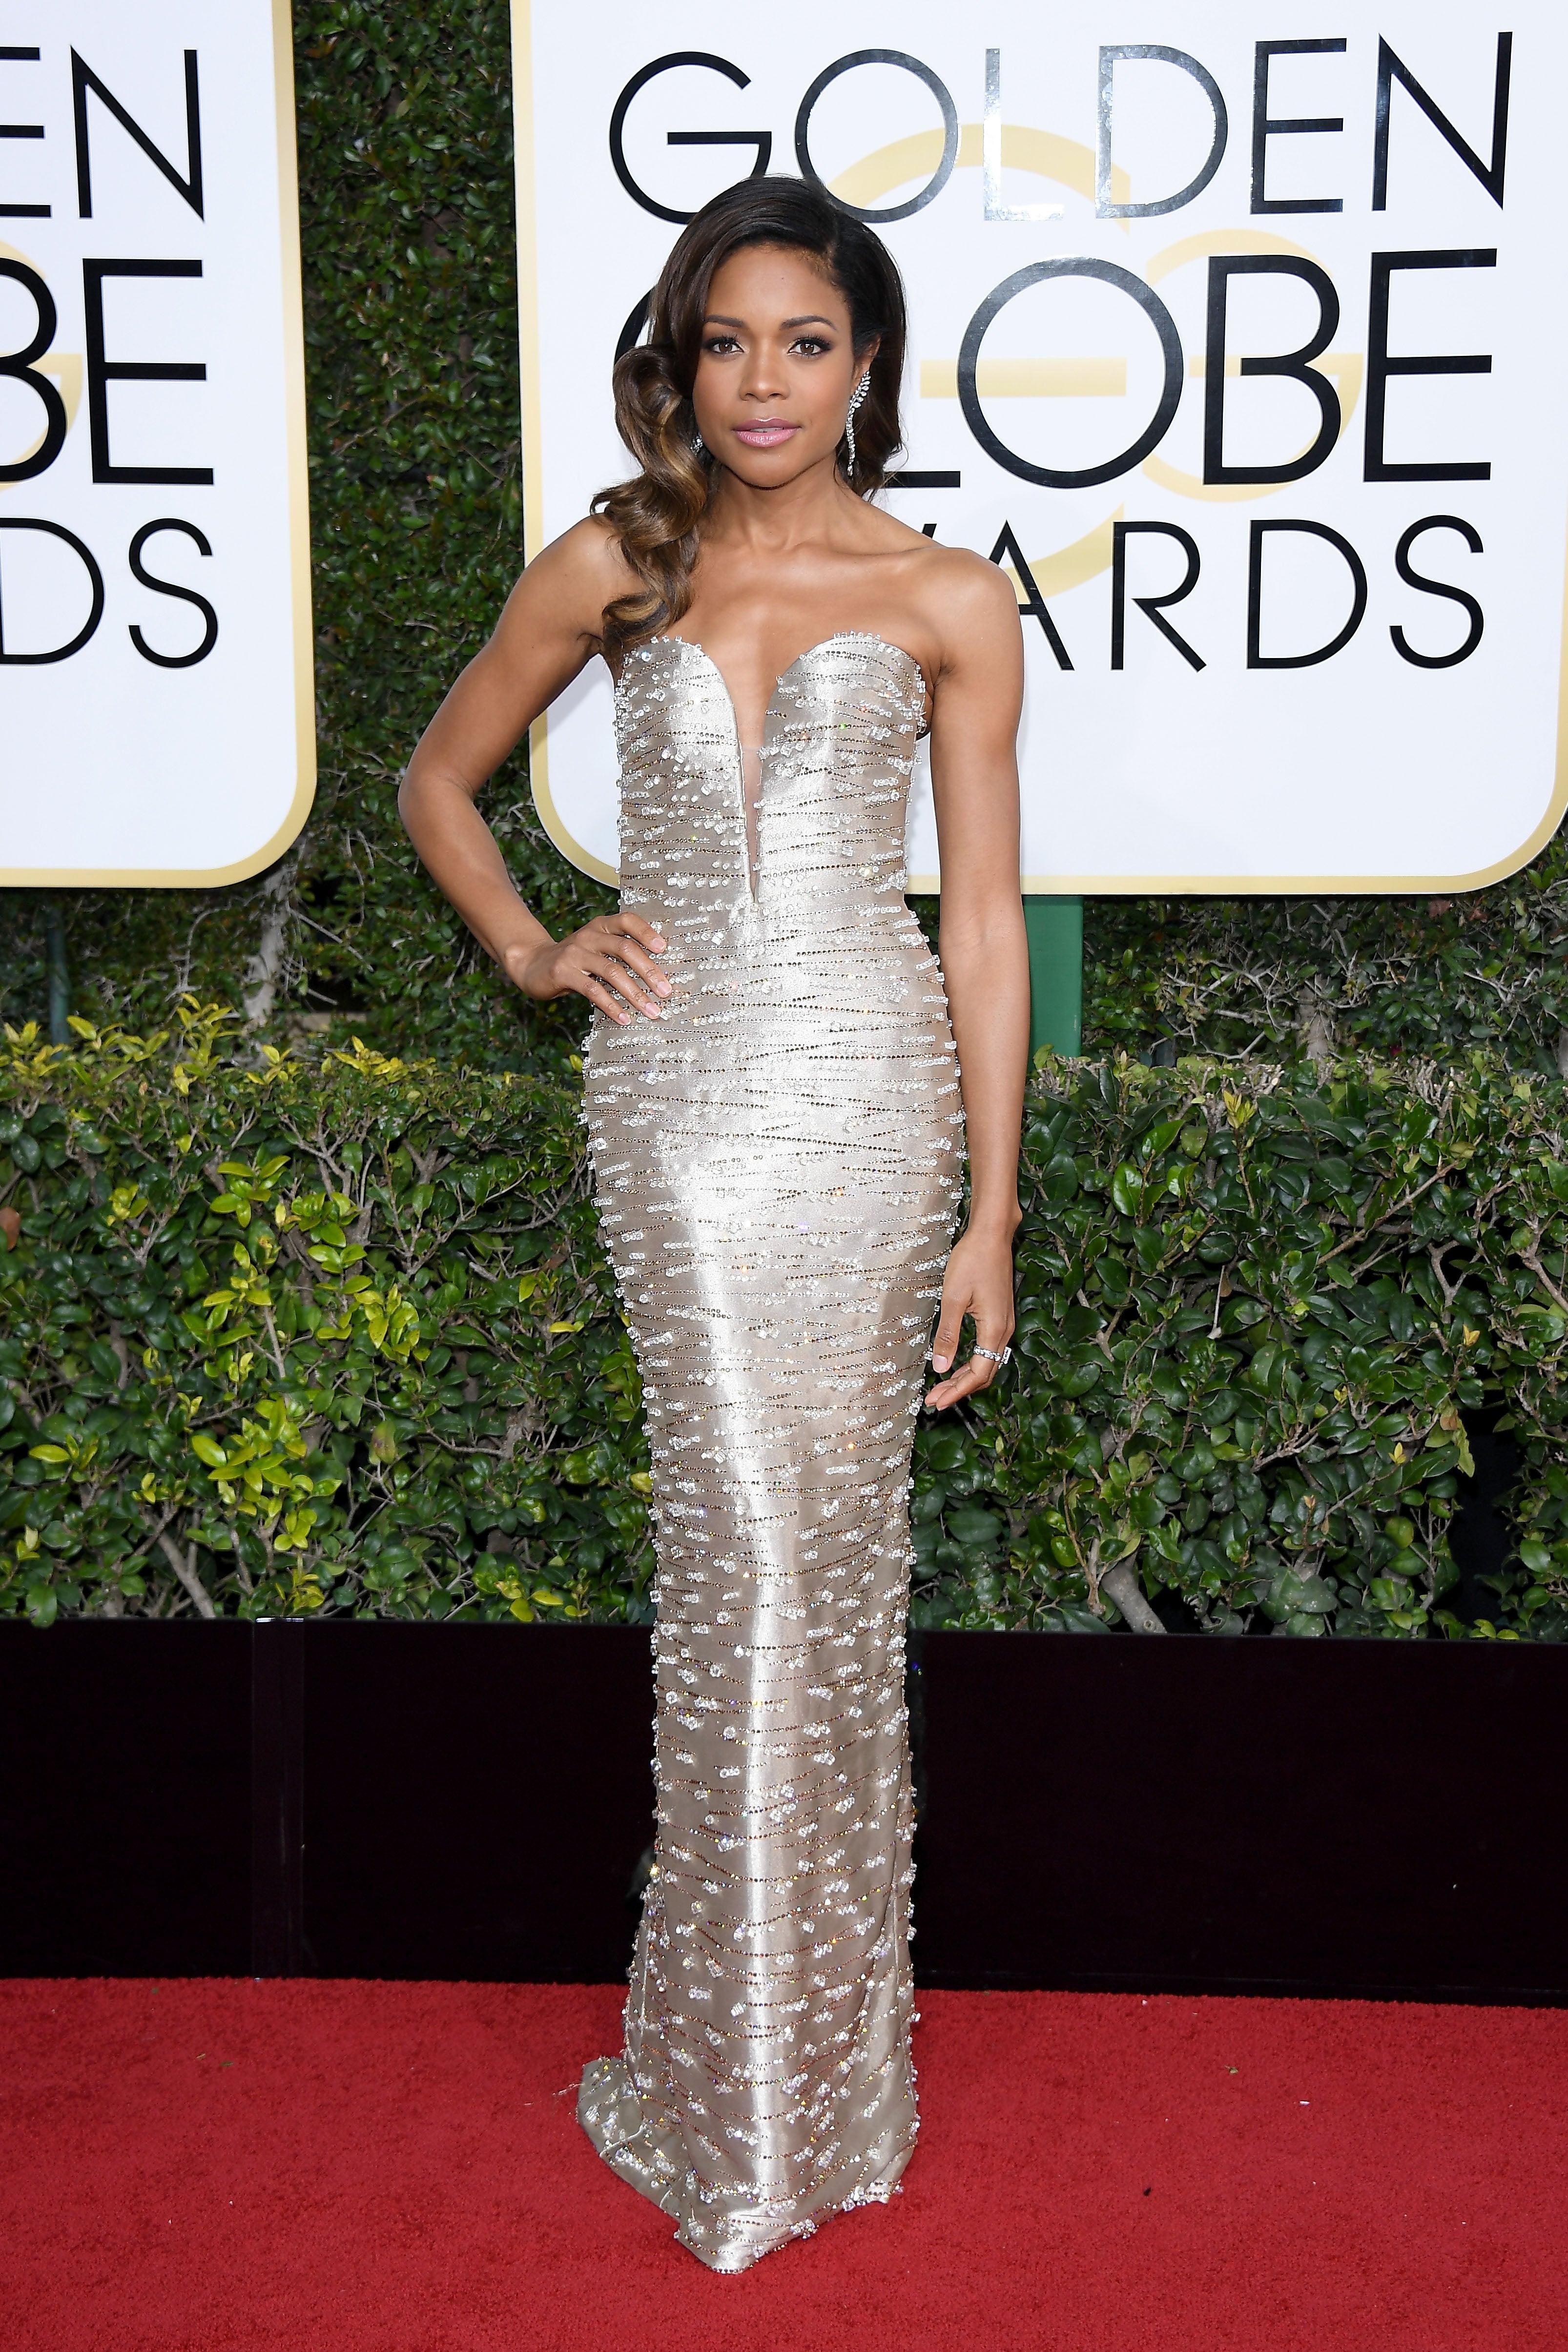 Naomi Harris Slayed The Red Carpet In A Custom Armani Gown - Essence